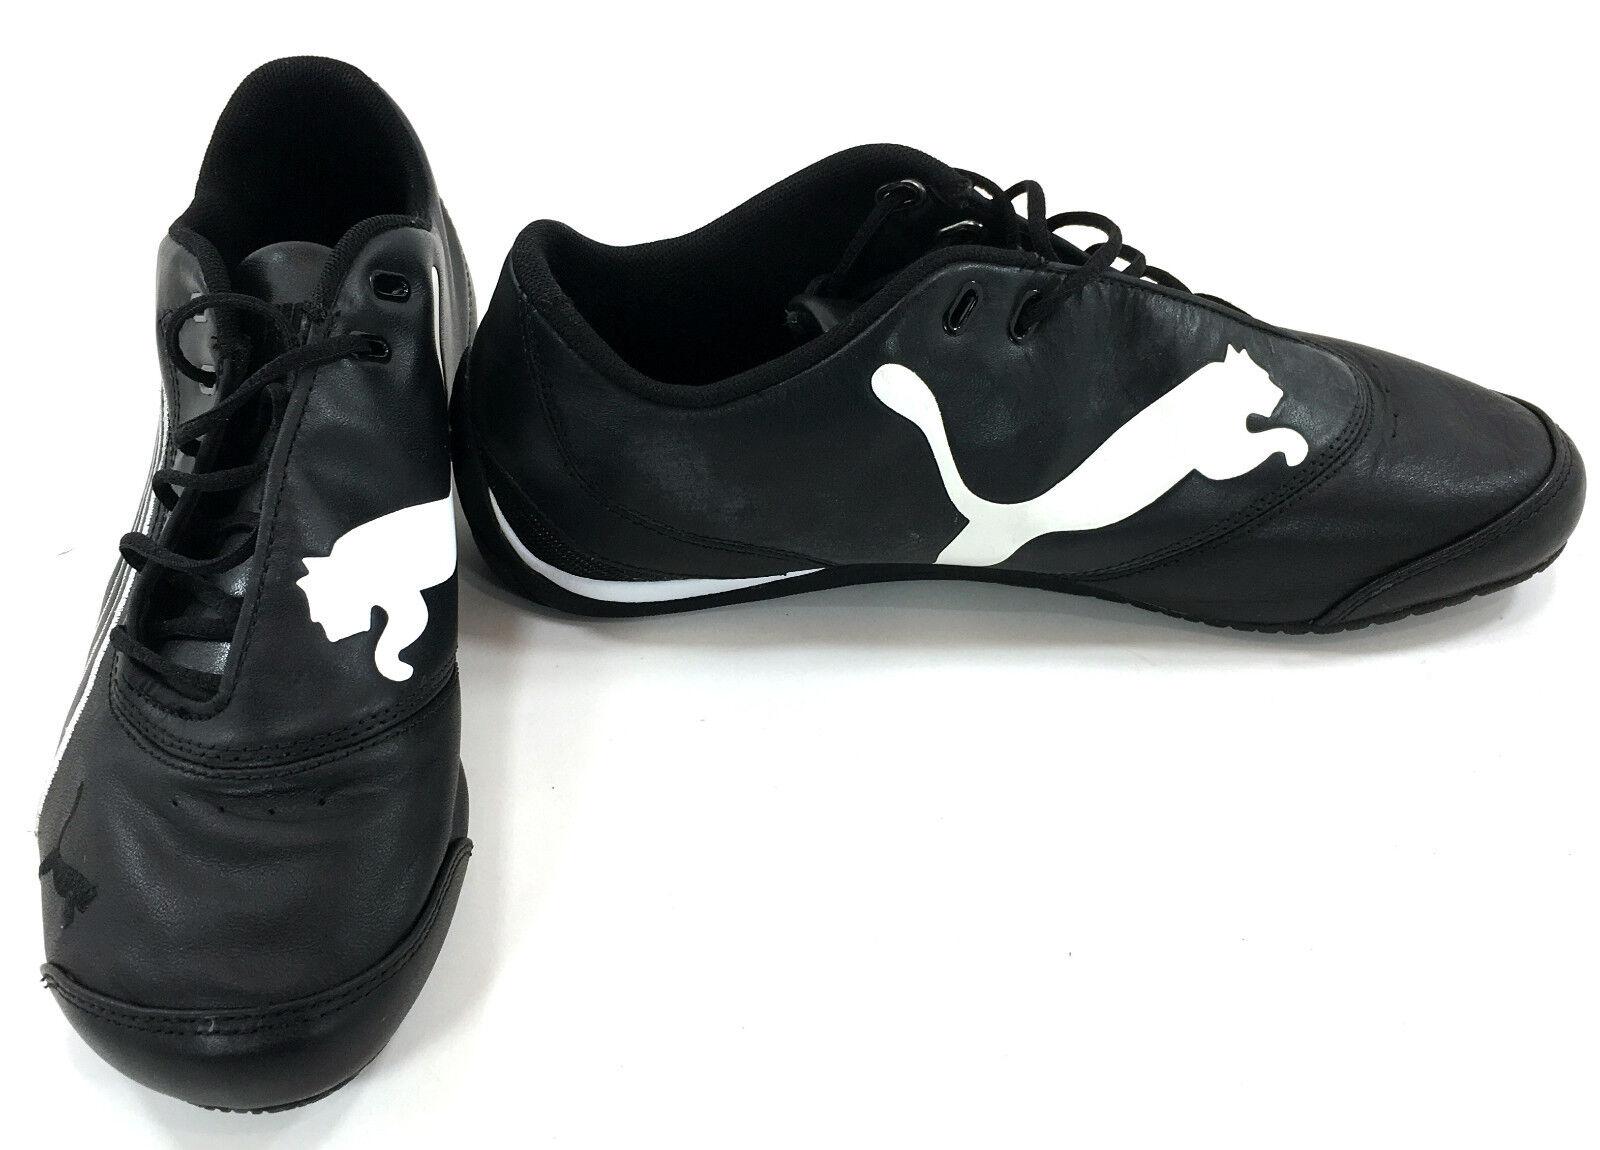 Puma Shoes Drift Cat III 3 SF Ferrari Black/White Sneakers Size 8.5